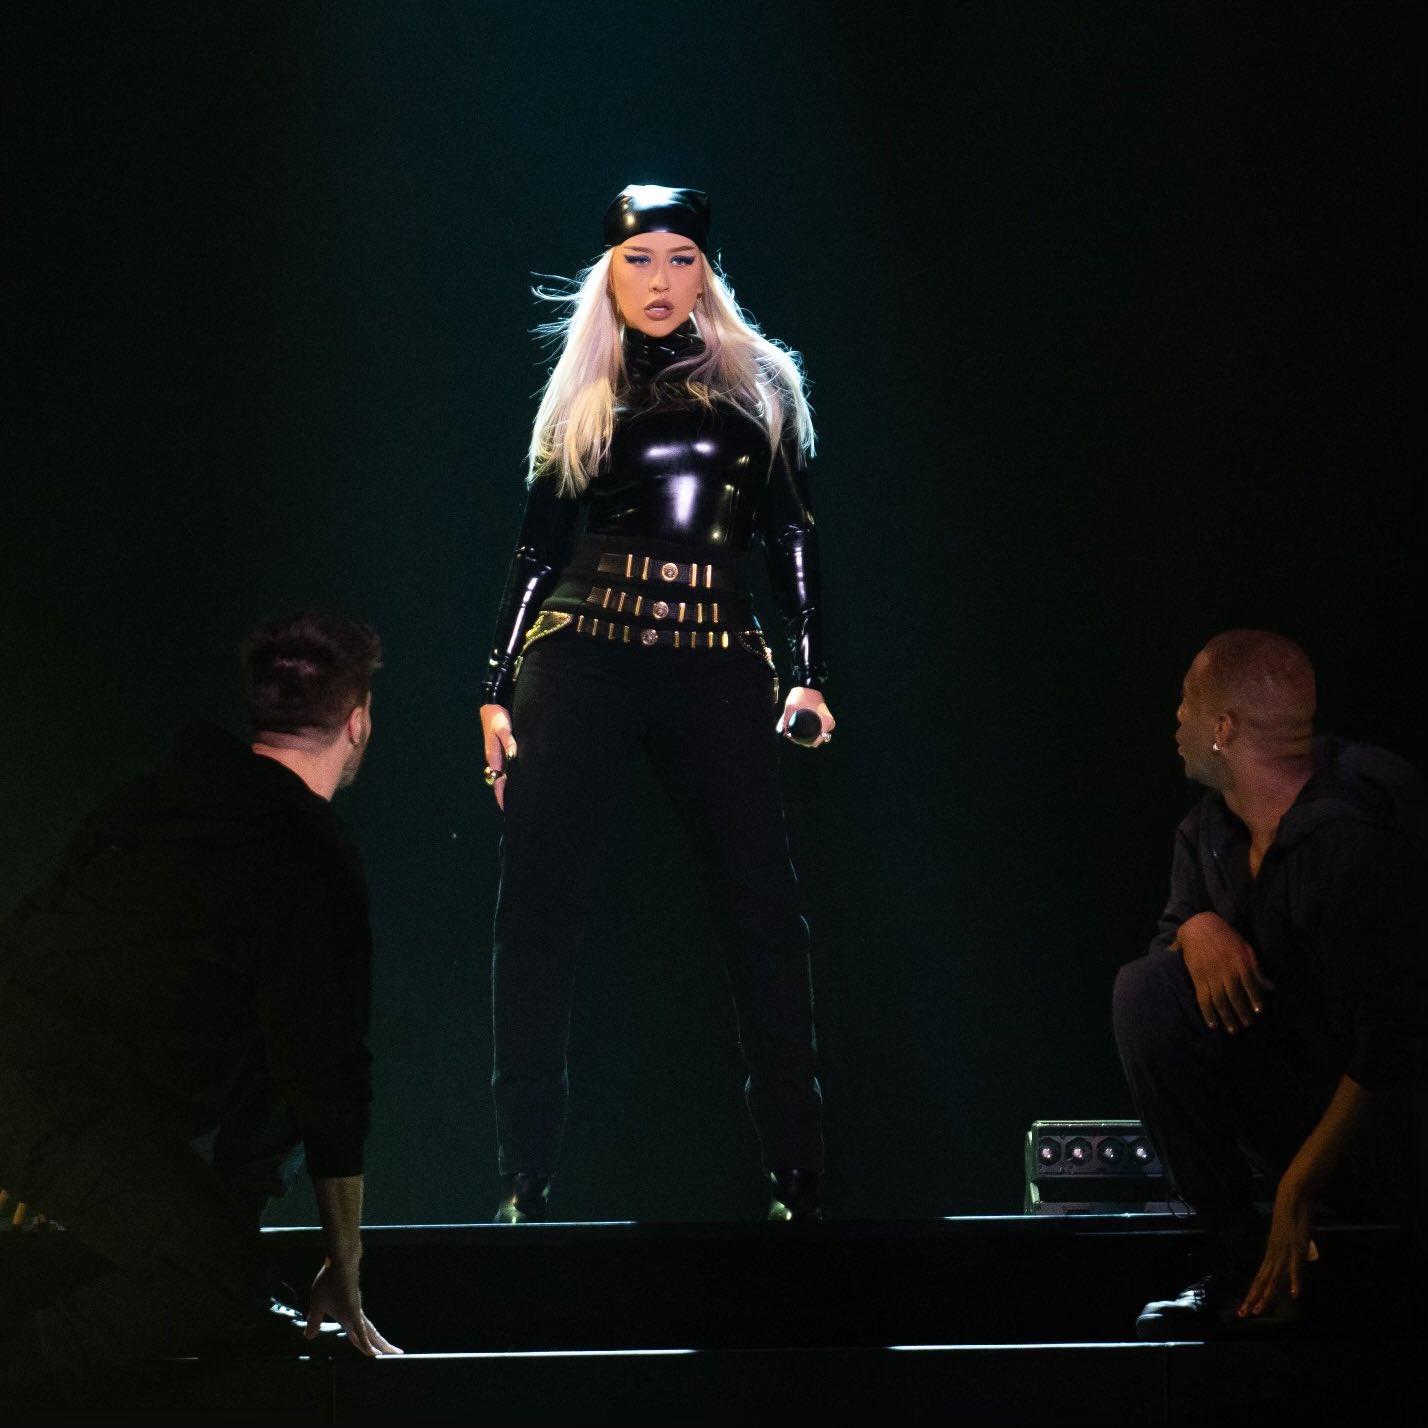 Christina Aguilera >> preparando nuevo álbum - Página 16 E3qSu5UXwAItlaj?format=jpg&name=large